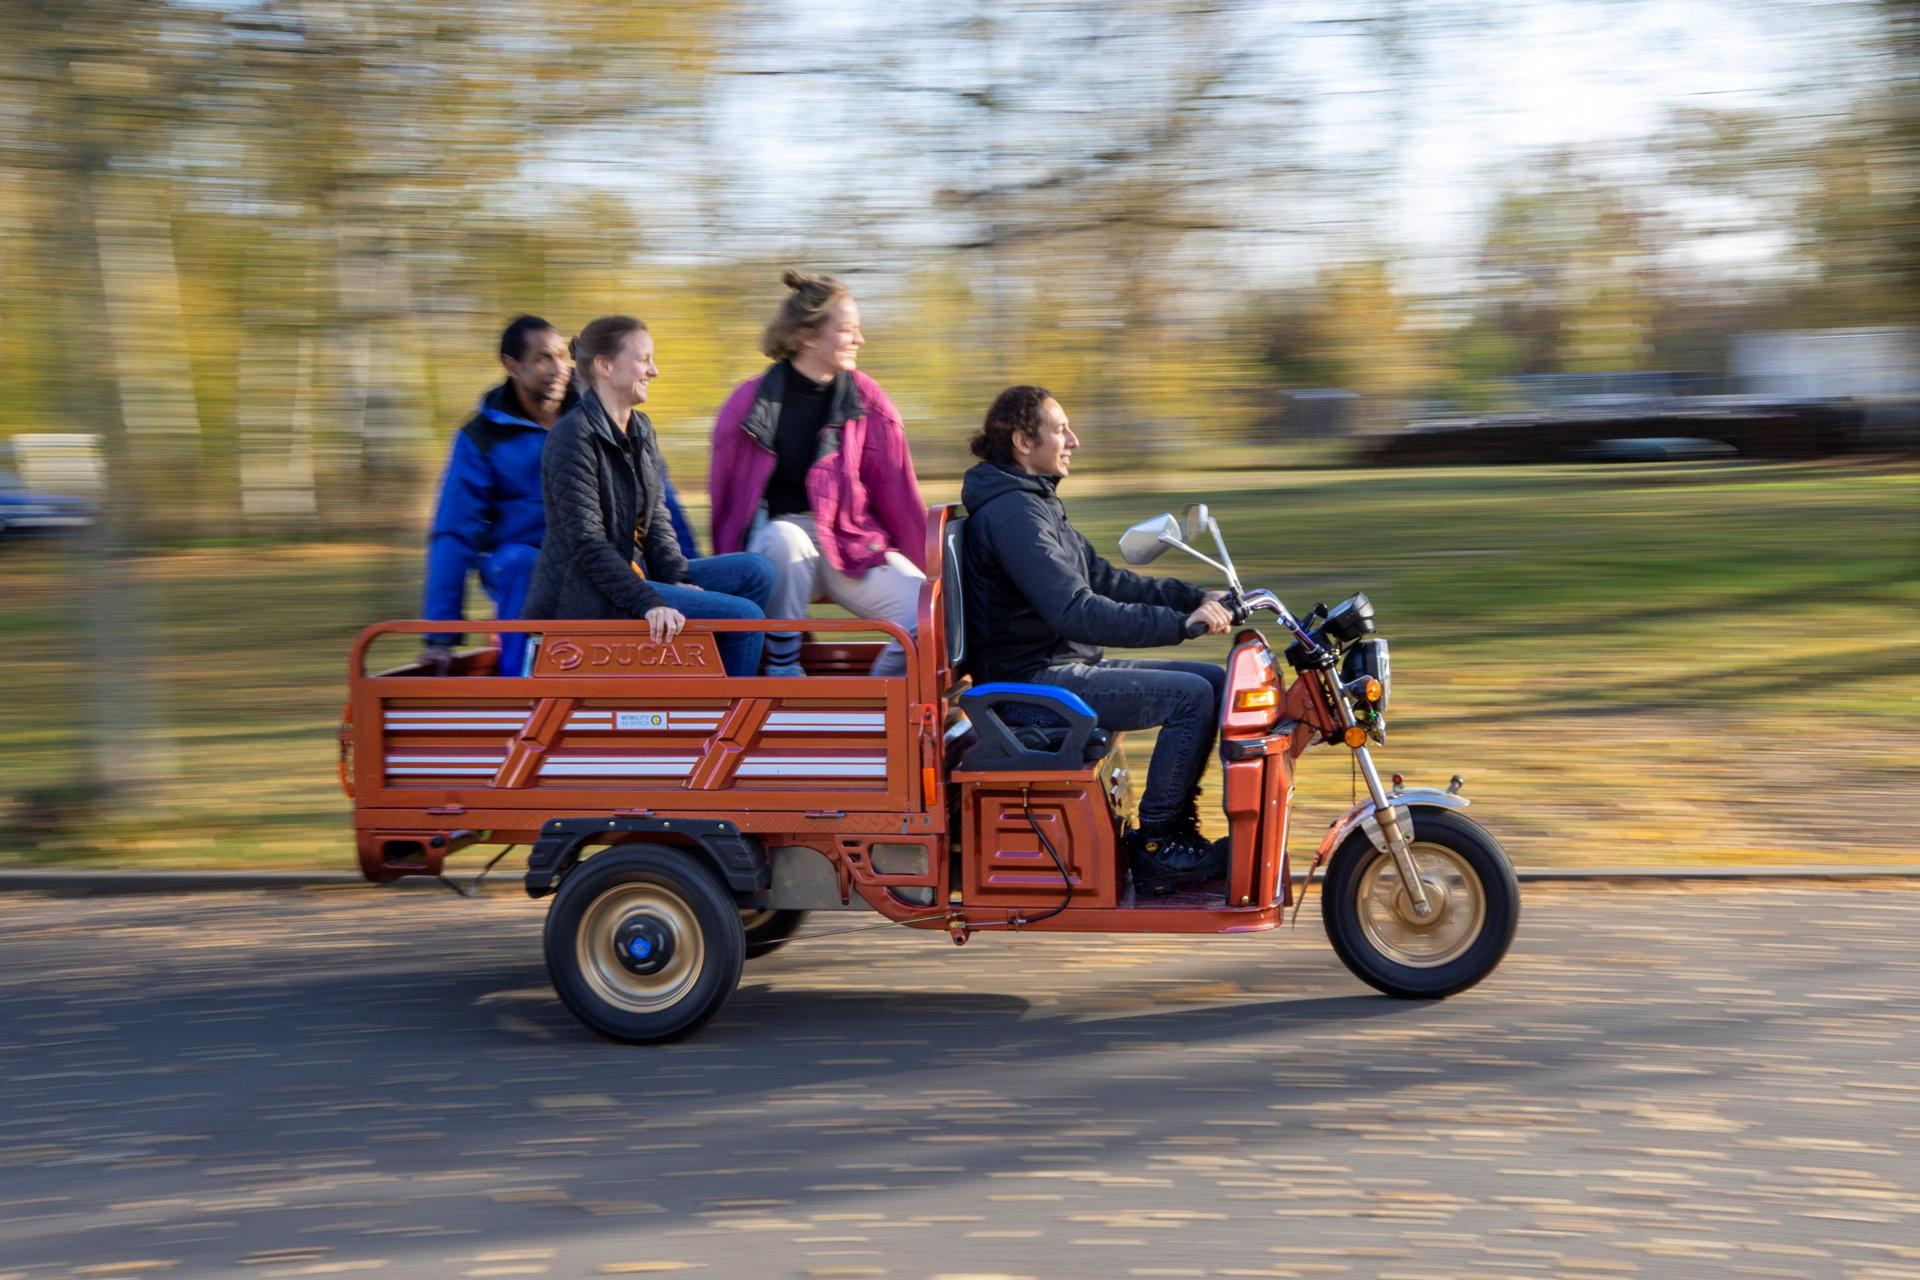 Vier Personen auf rotem, dreirädrigem Kleinfahrzeug.